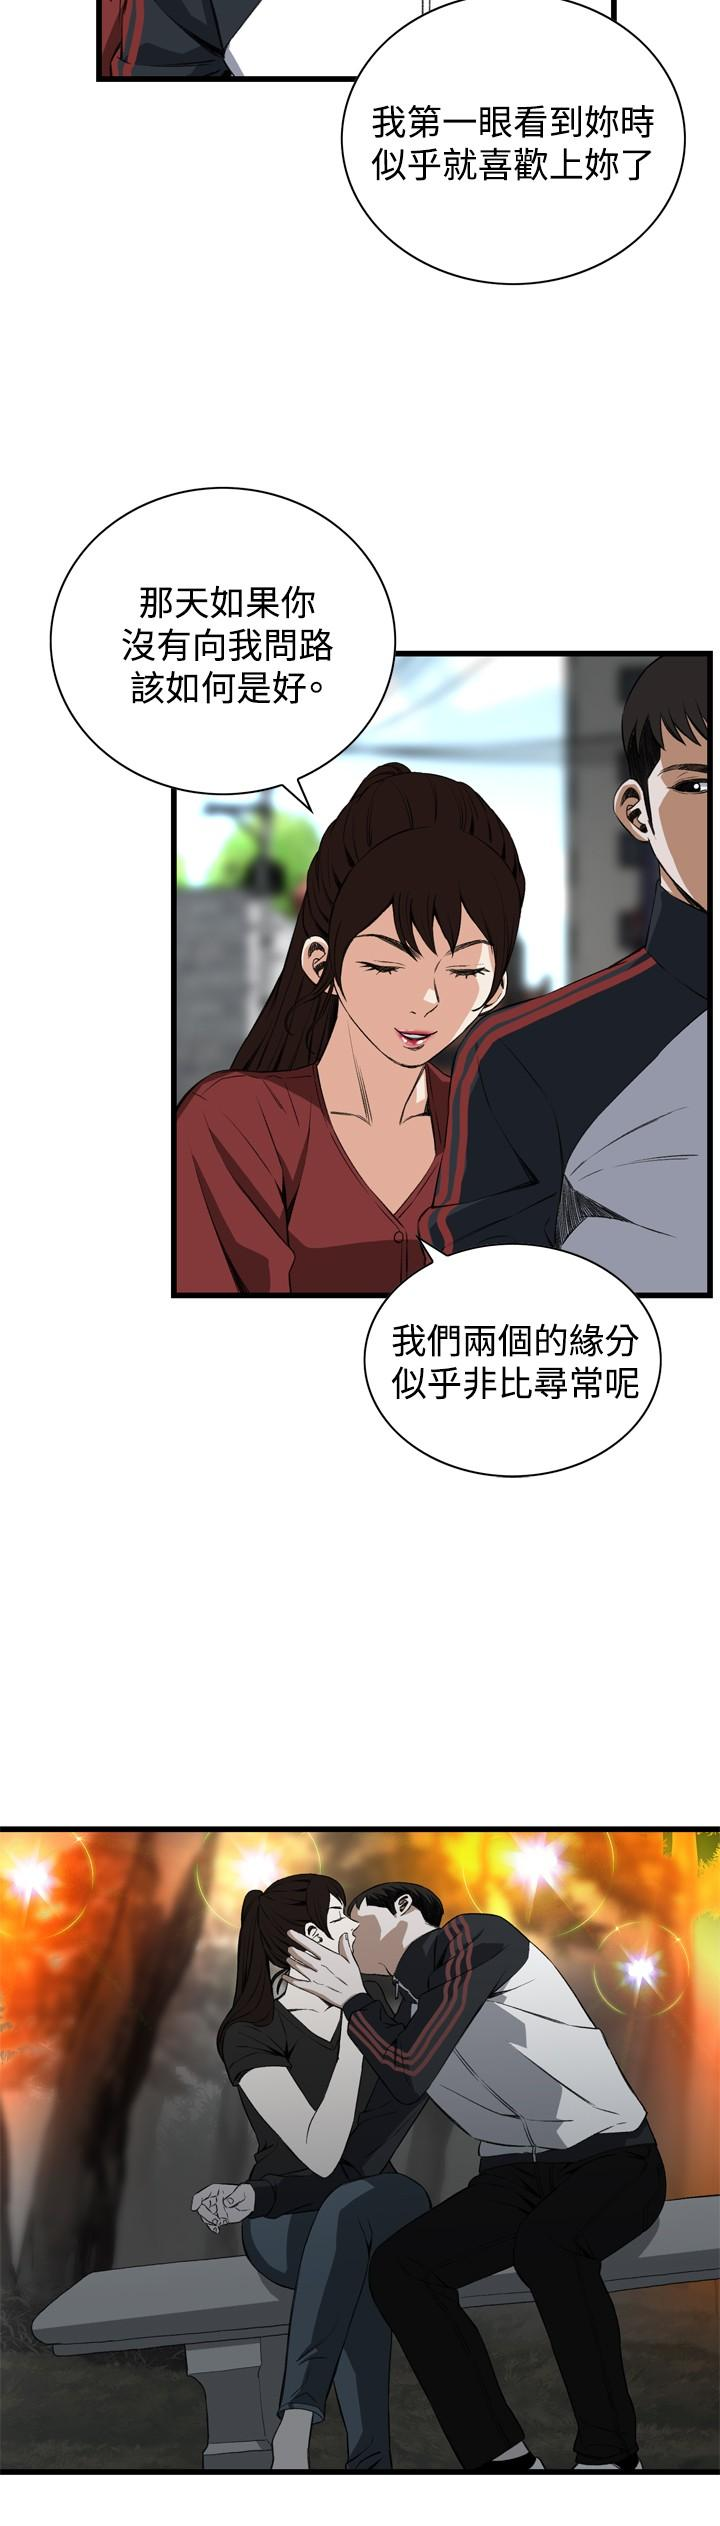 Take a Peek 偷窥 Ch.39~60 [Chinese]中文 609